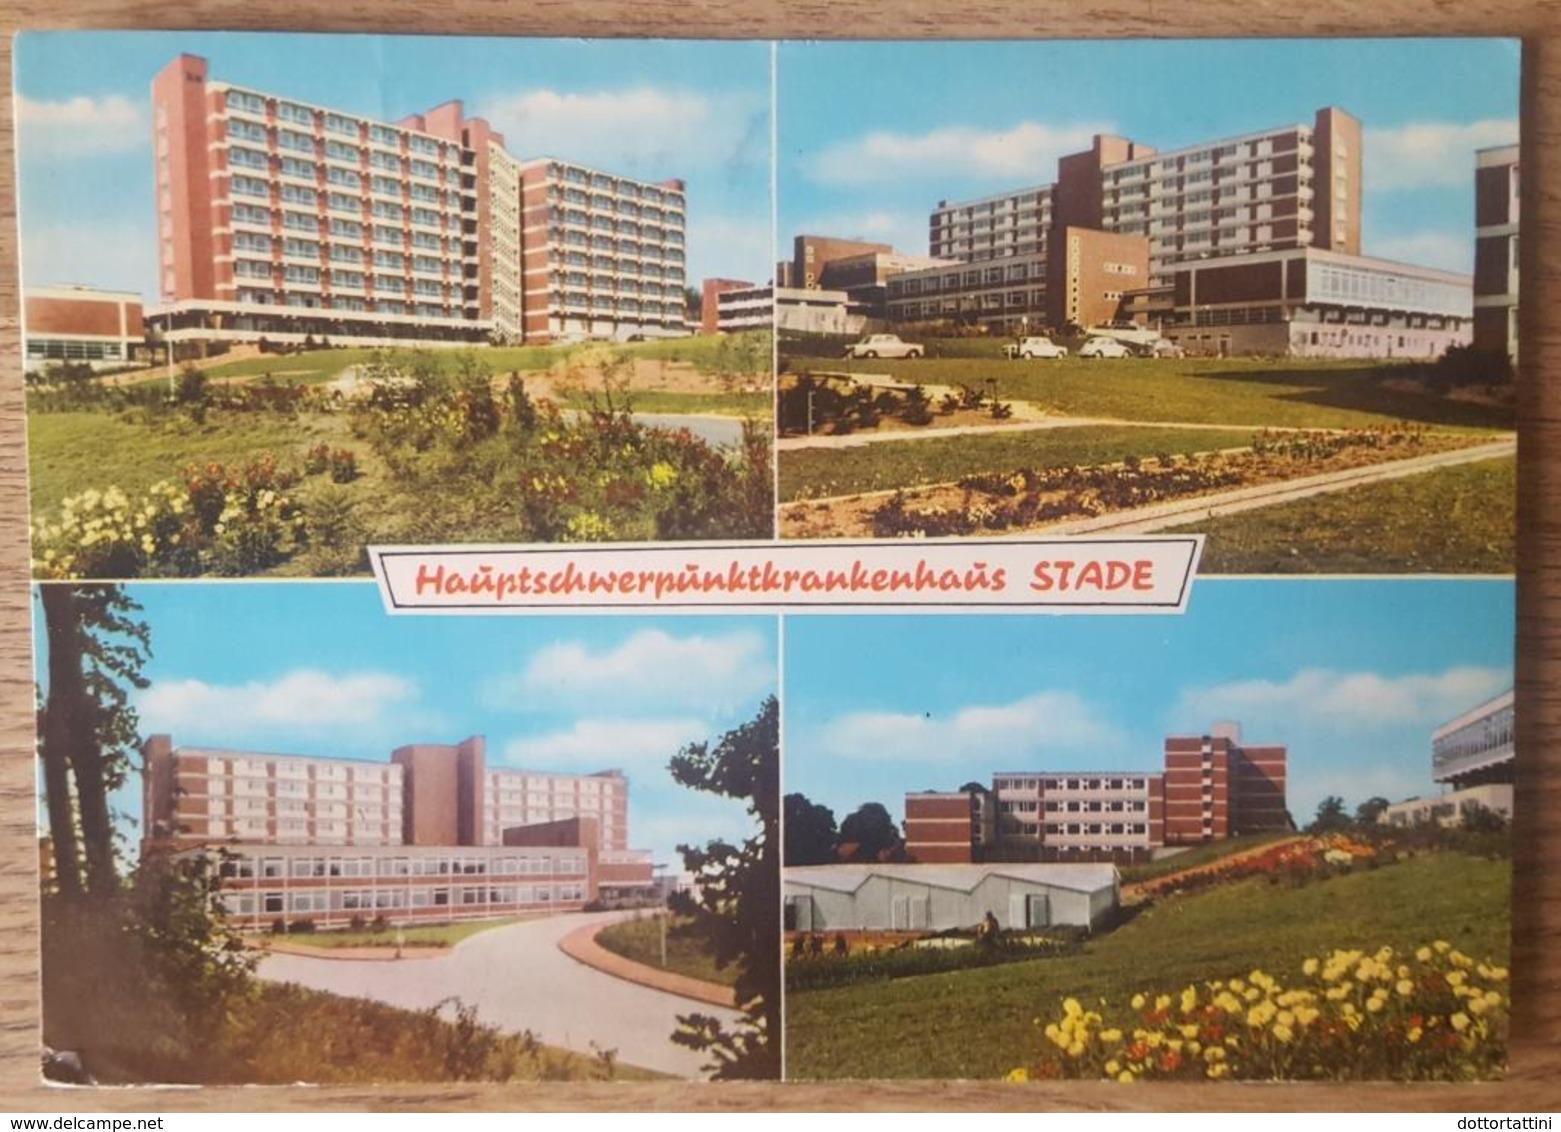 Stade - HAUPTSCHWERPUNKTKRANKENHAUS  VG  G2 - Stade